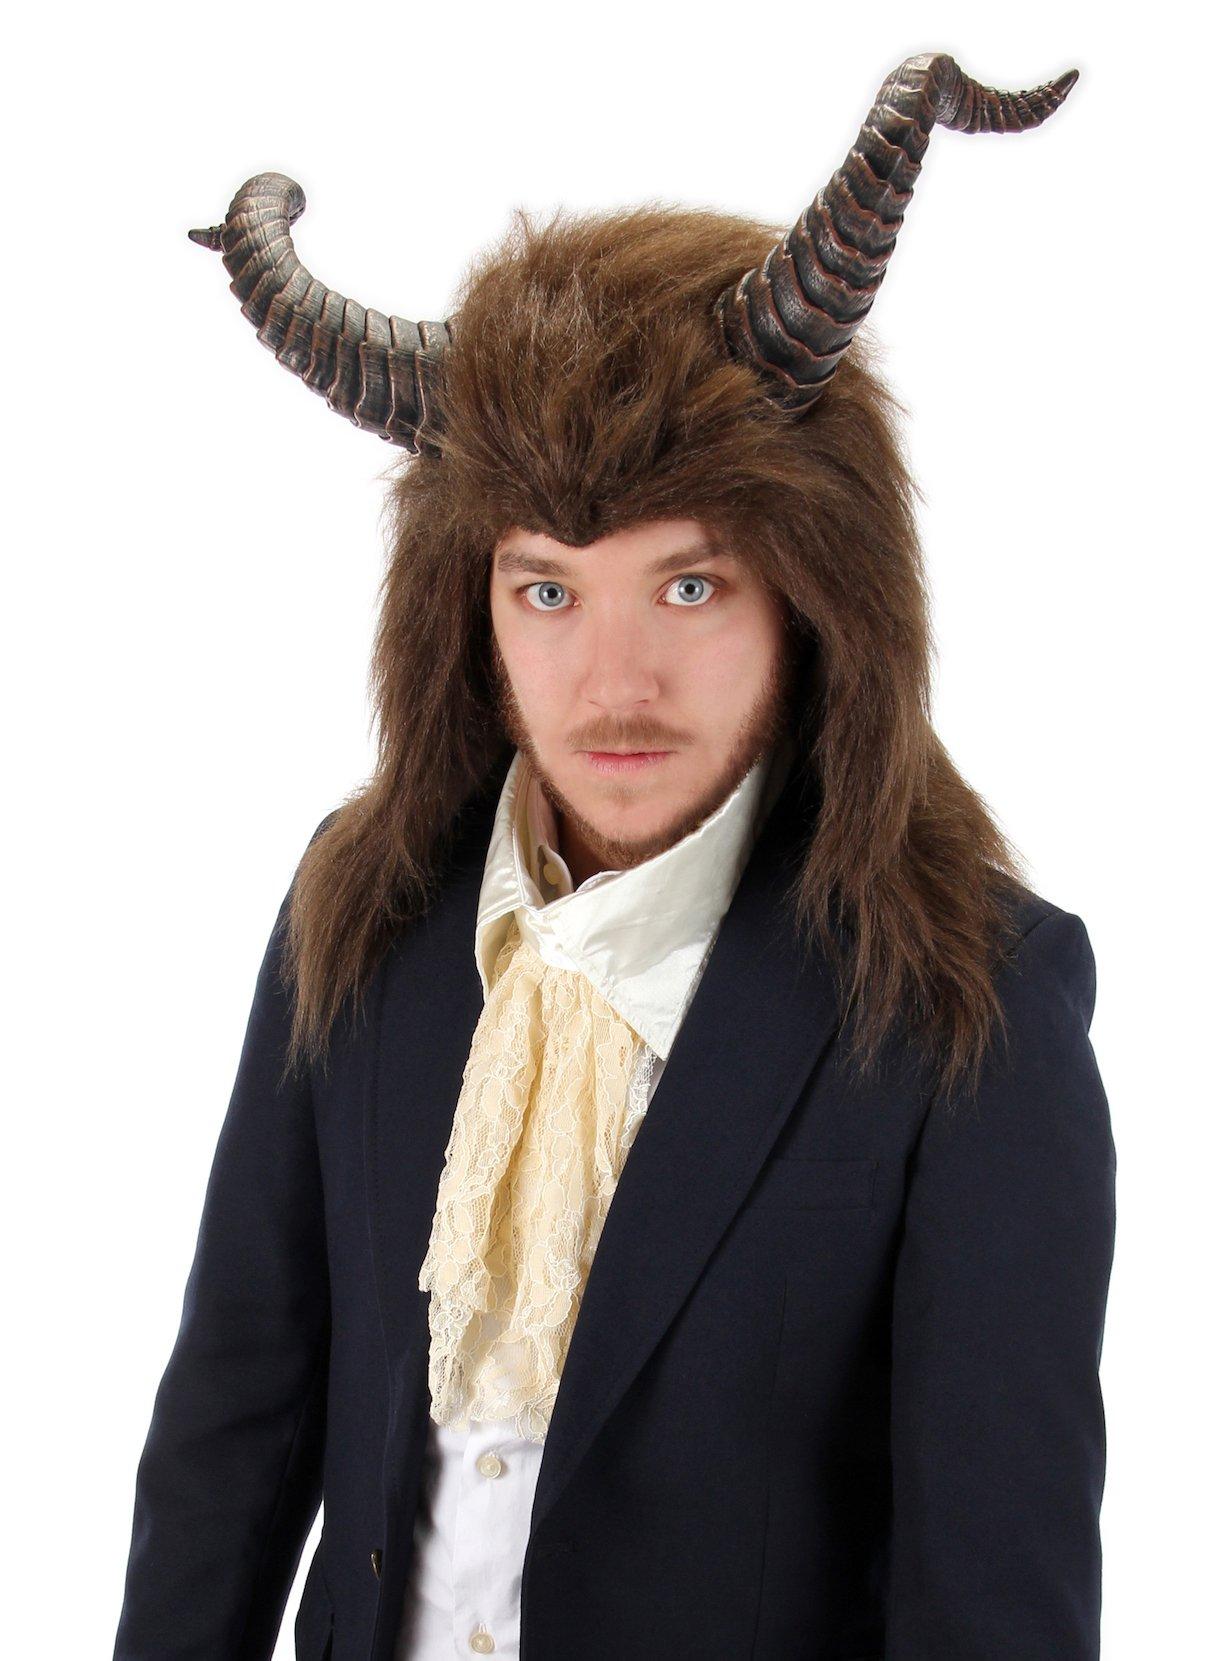 Disney Beauty and the Beast - Beast Costume Hood with Horns